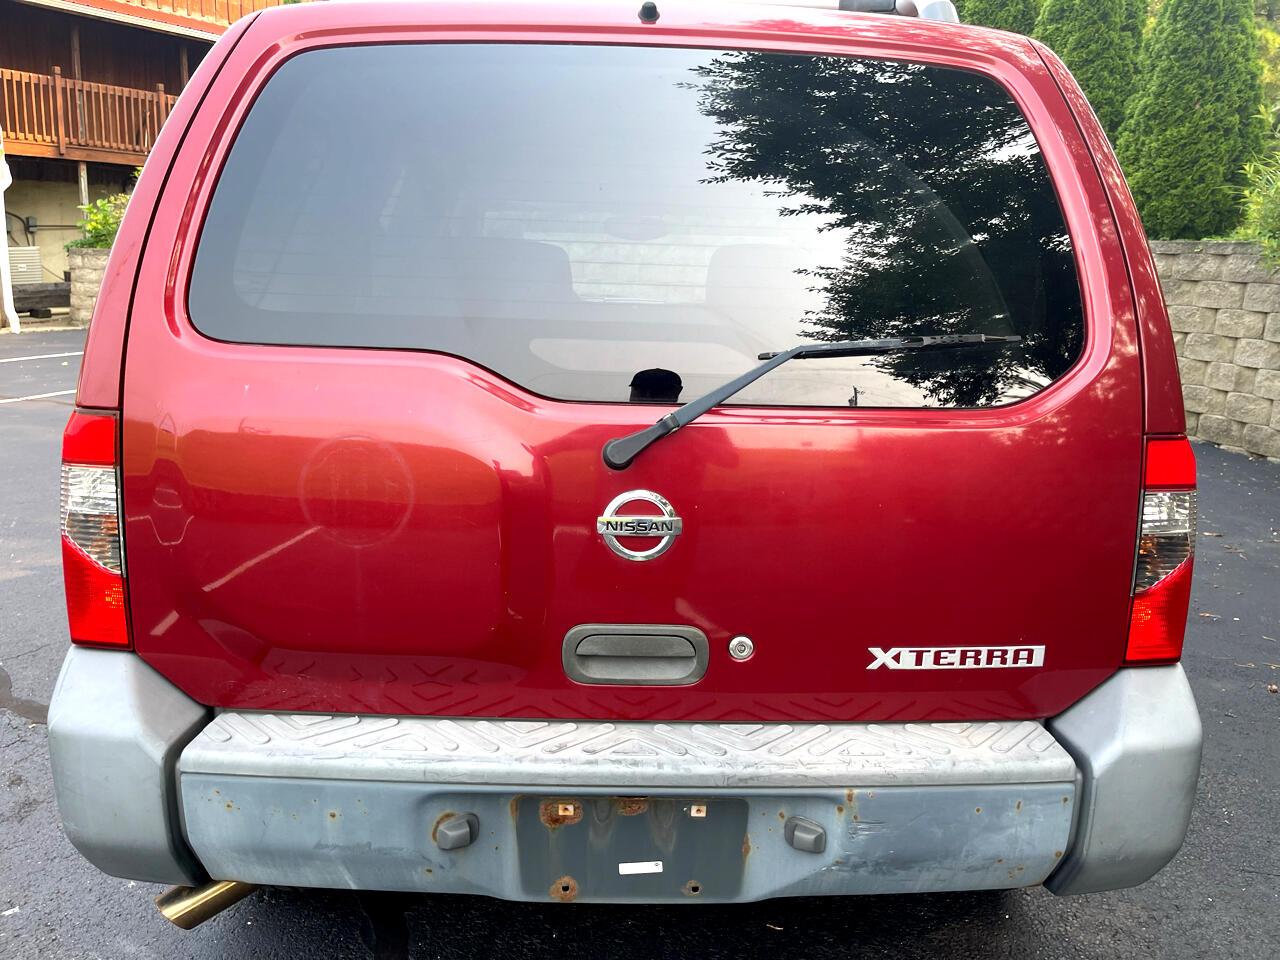 Nissan Xterra 4dr XE 4WD V6 Auto 2004